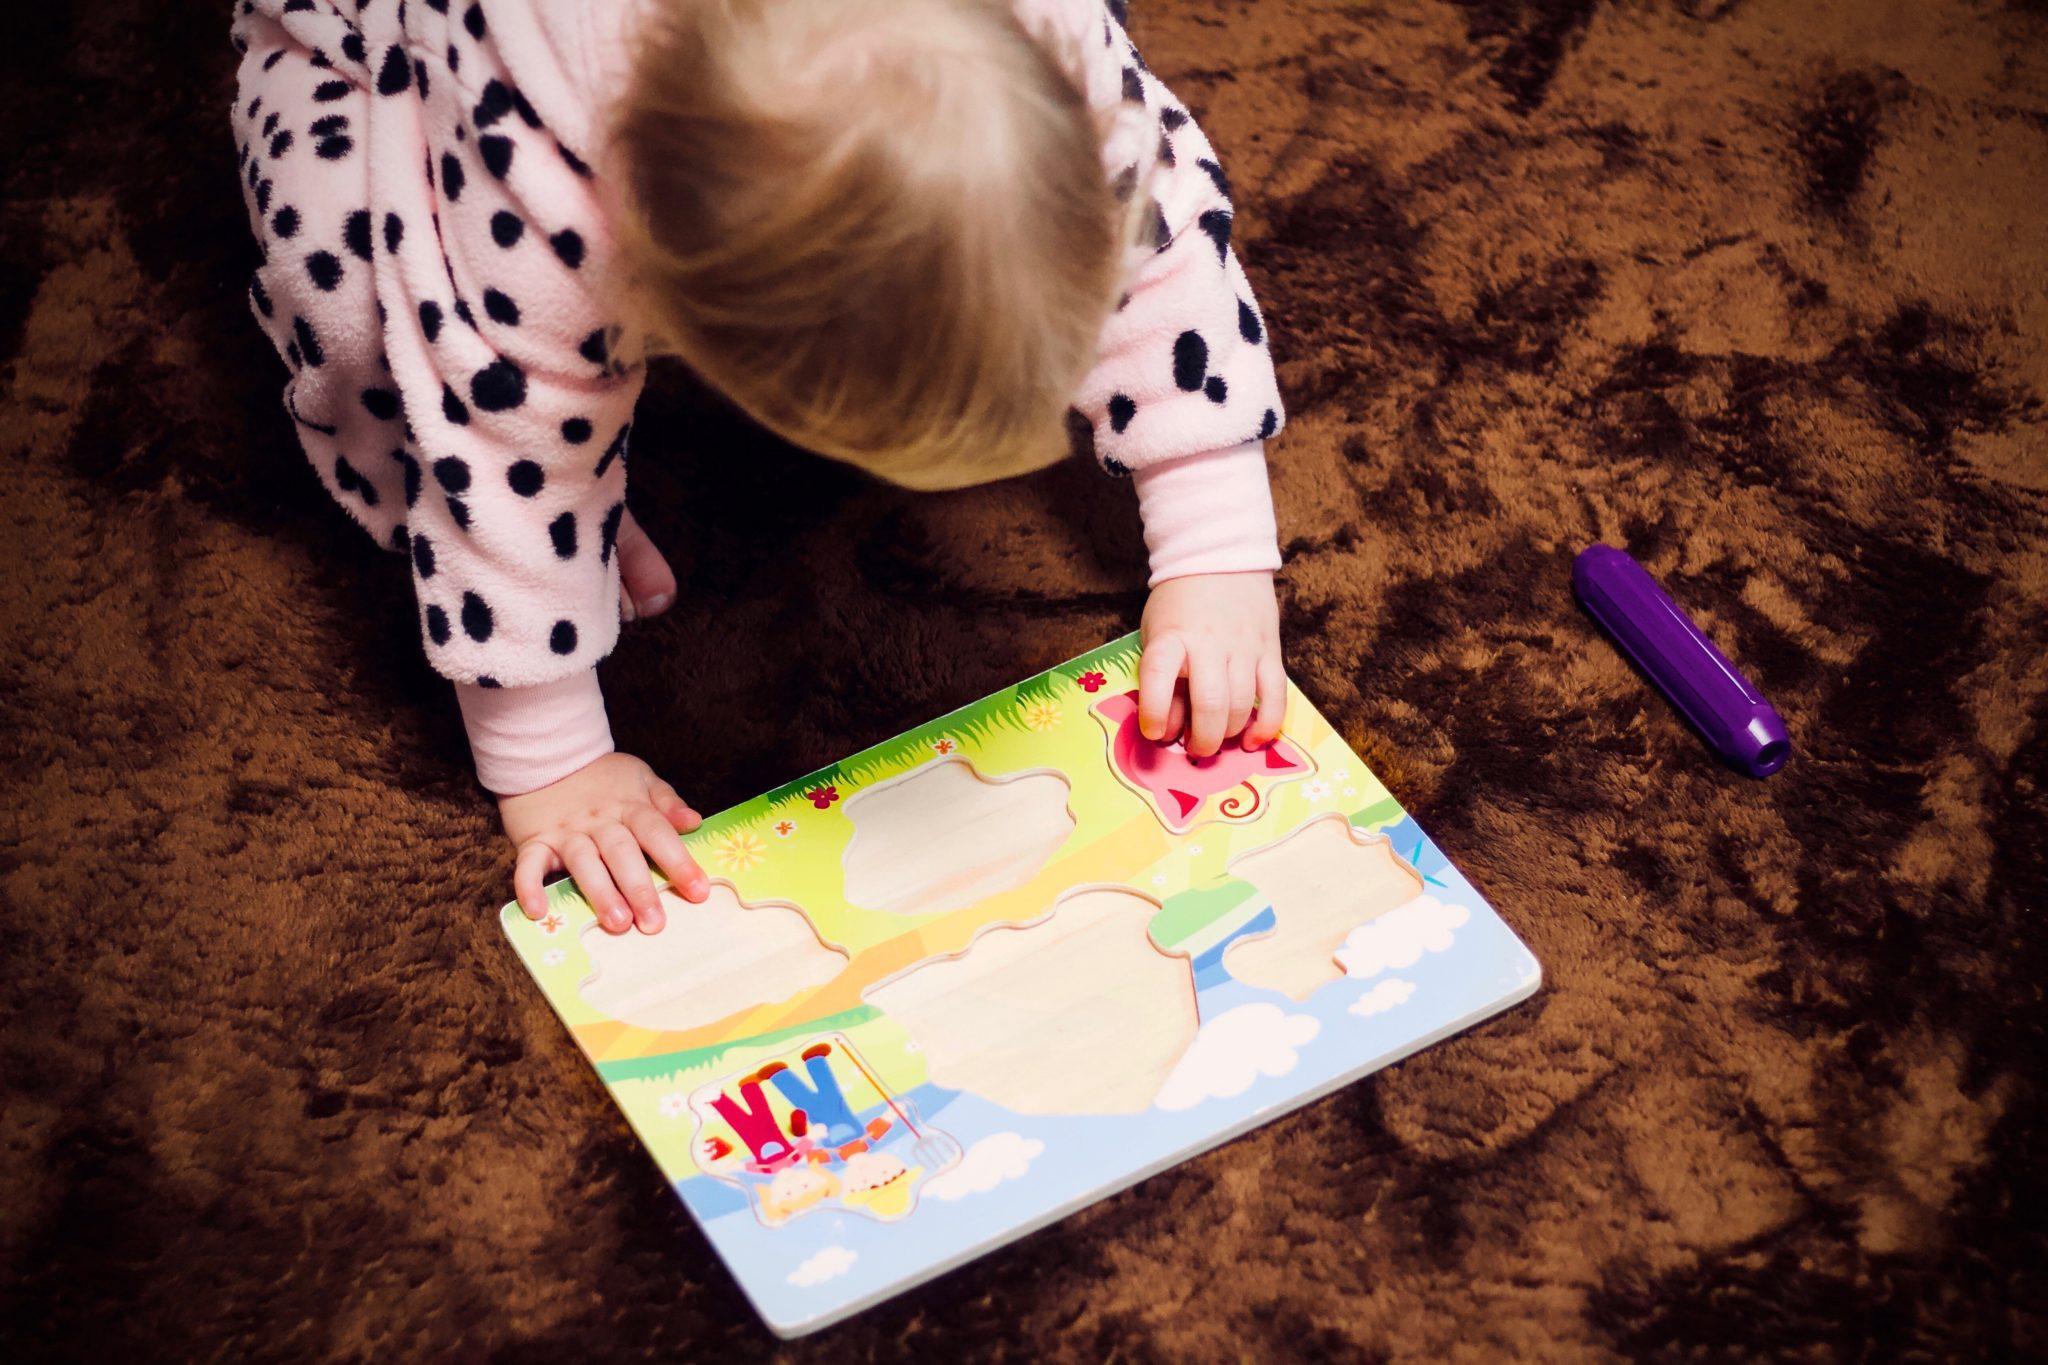 Child solving a puzzle.